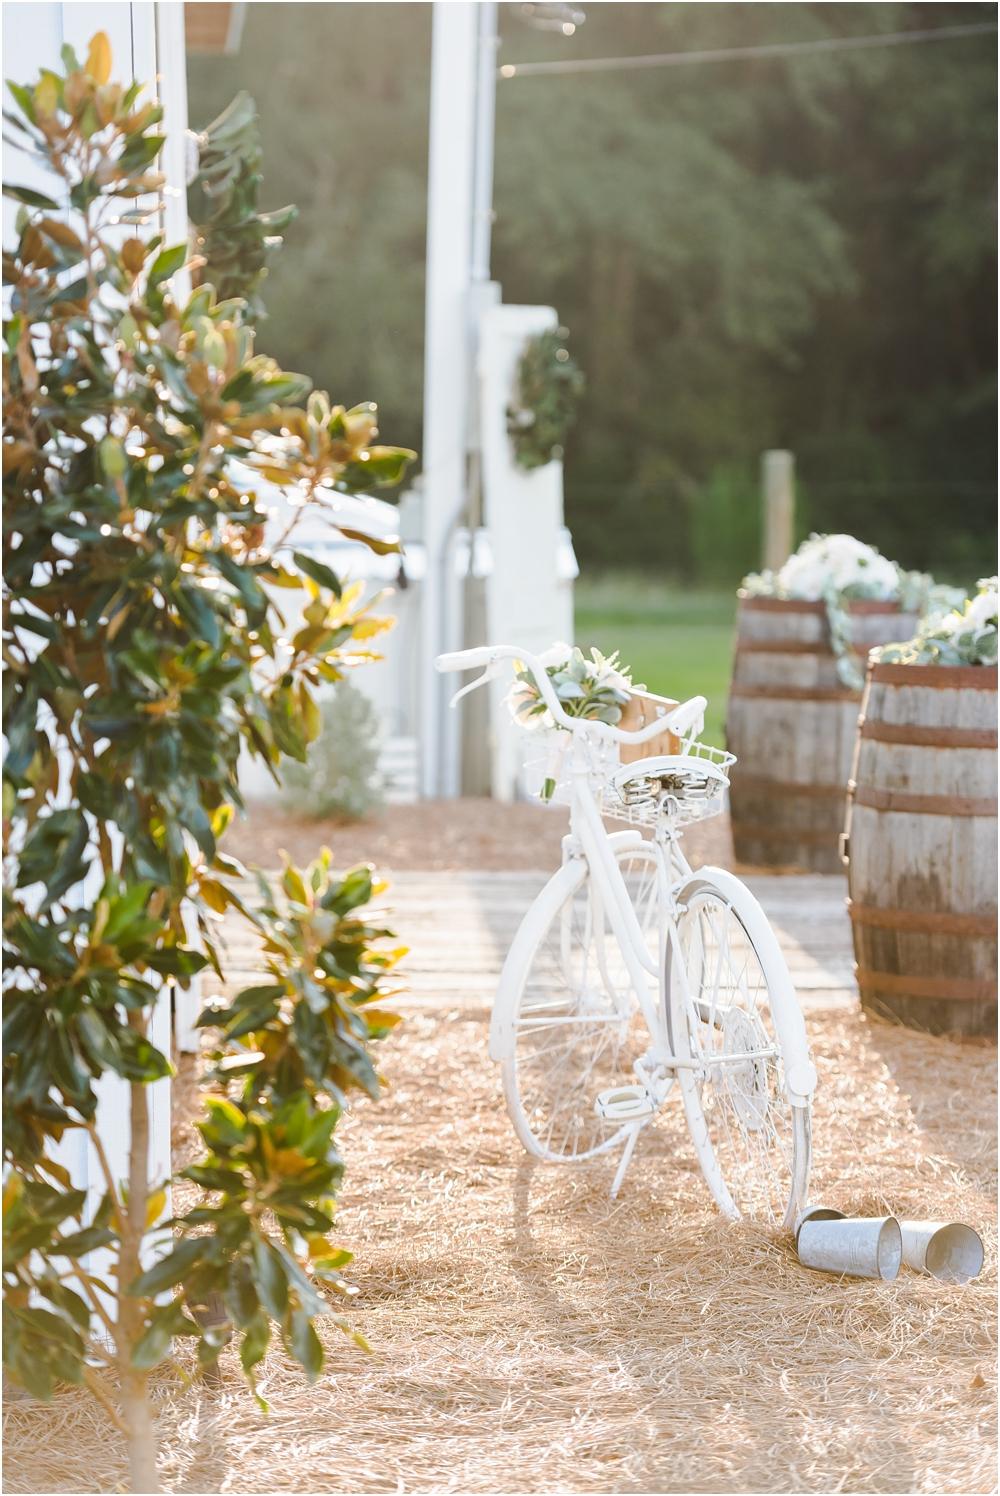 mosley-wedding-kiersten-stevenson-photography-30a-panama-city-beach-dothan-tallahassee-(170-of-472).JPG